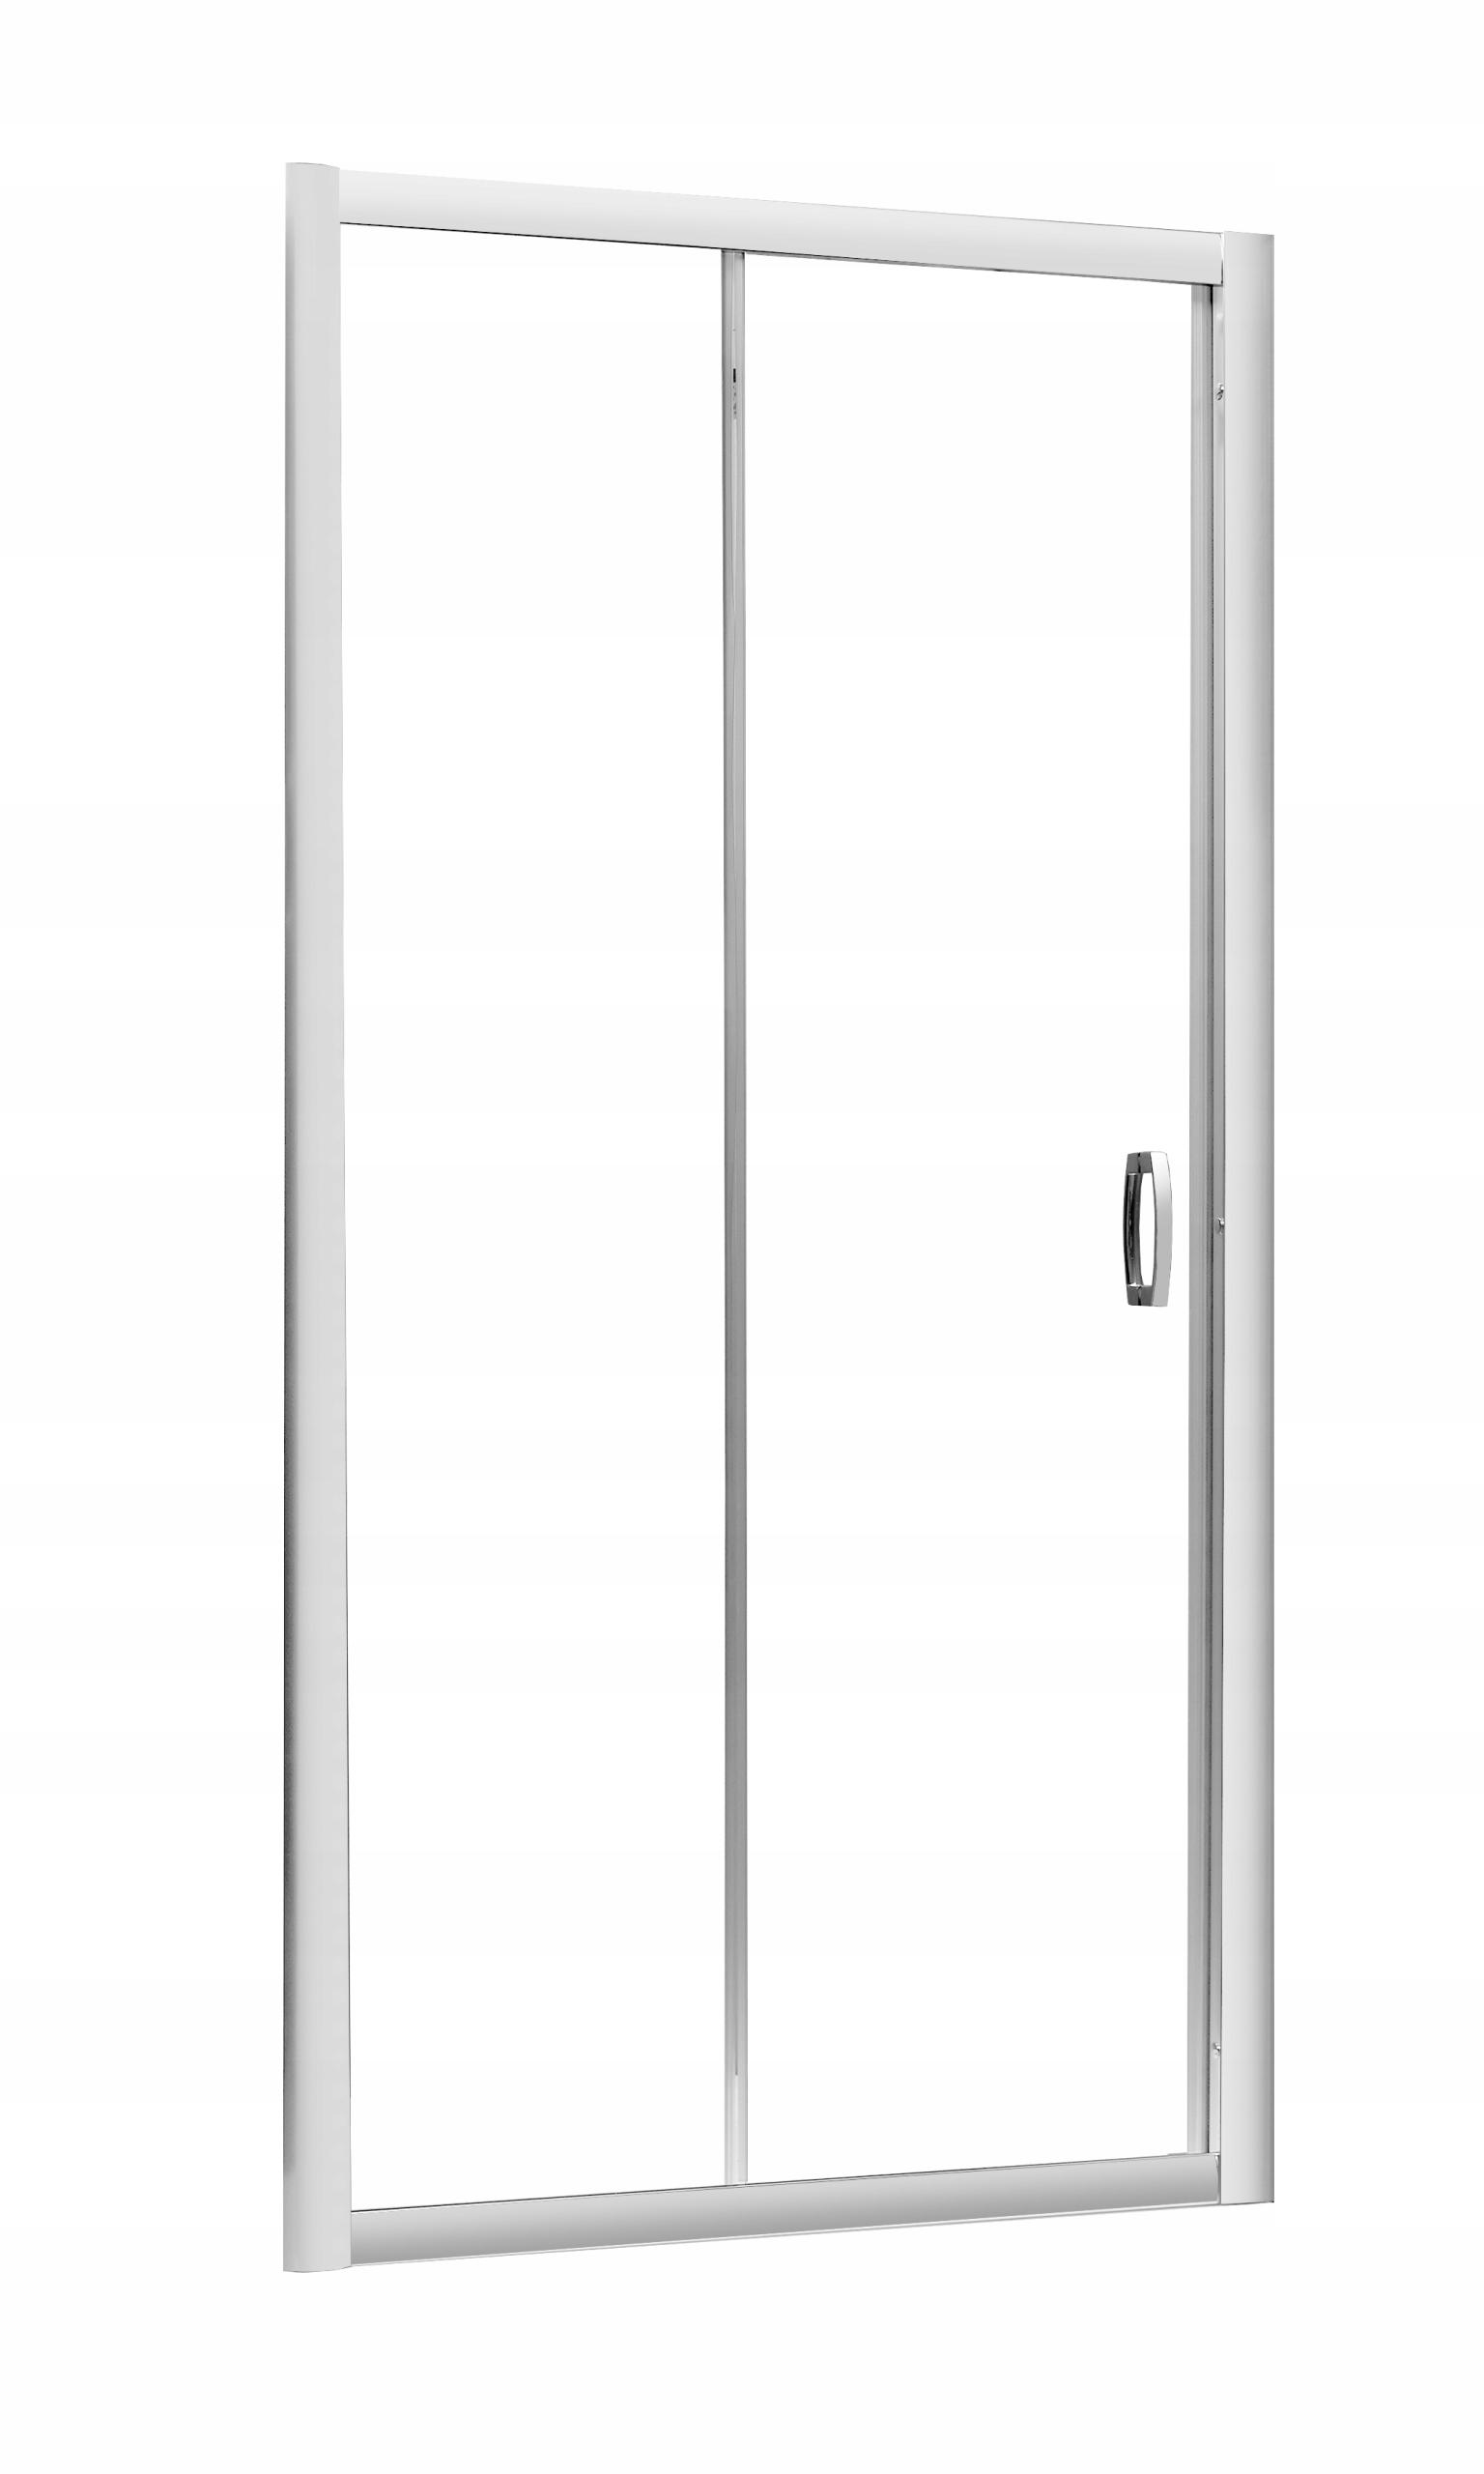 Dvere Premium Plus DWJ 120x190 cm RADAWAY